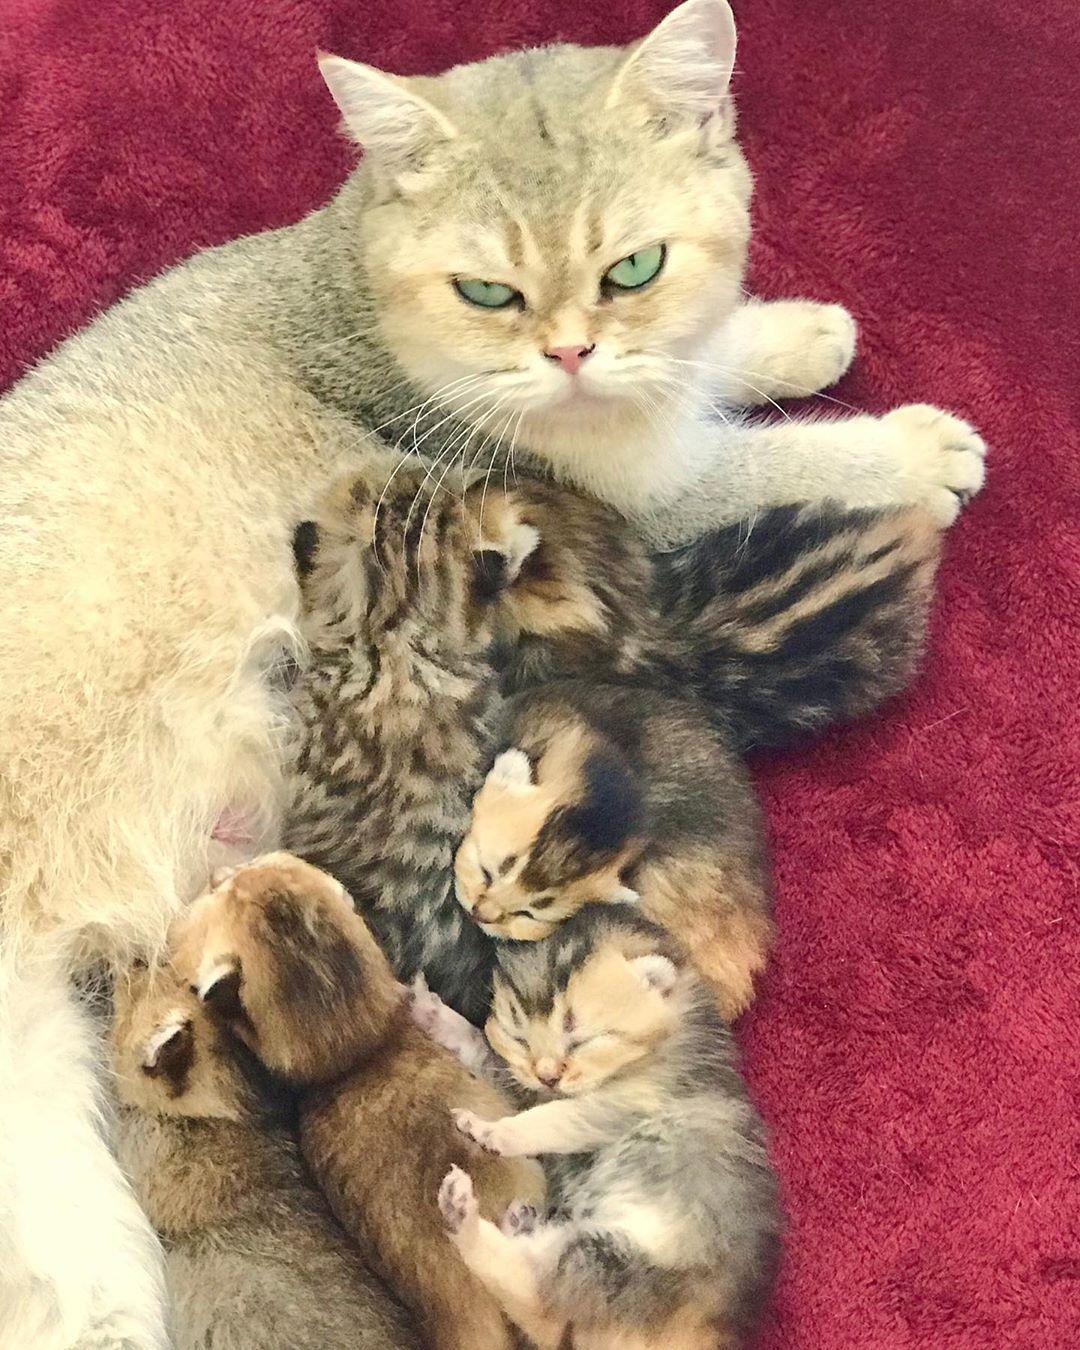 Cat Breeder In Florida Www Britishscottishkittens Com Meow Kittens Kitten Cat Cats Kitty Kitties Cute Britishshorthair Sco Cats Kittens Baby Animals Kitten For Sale